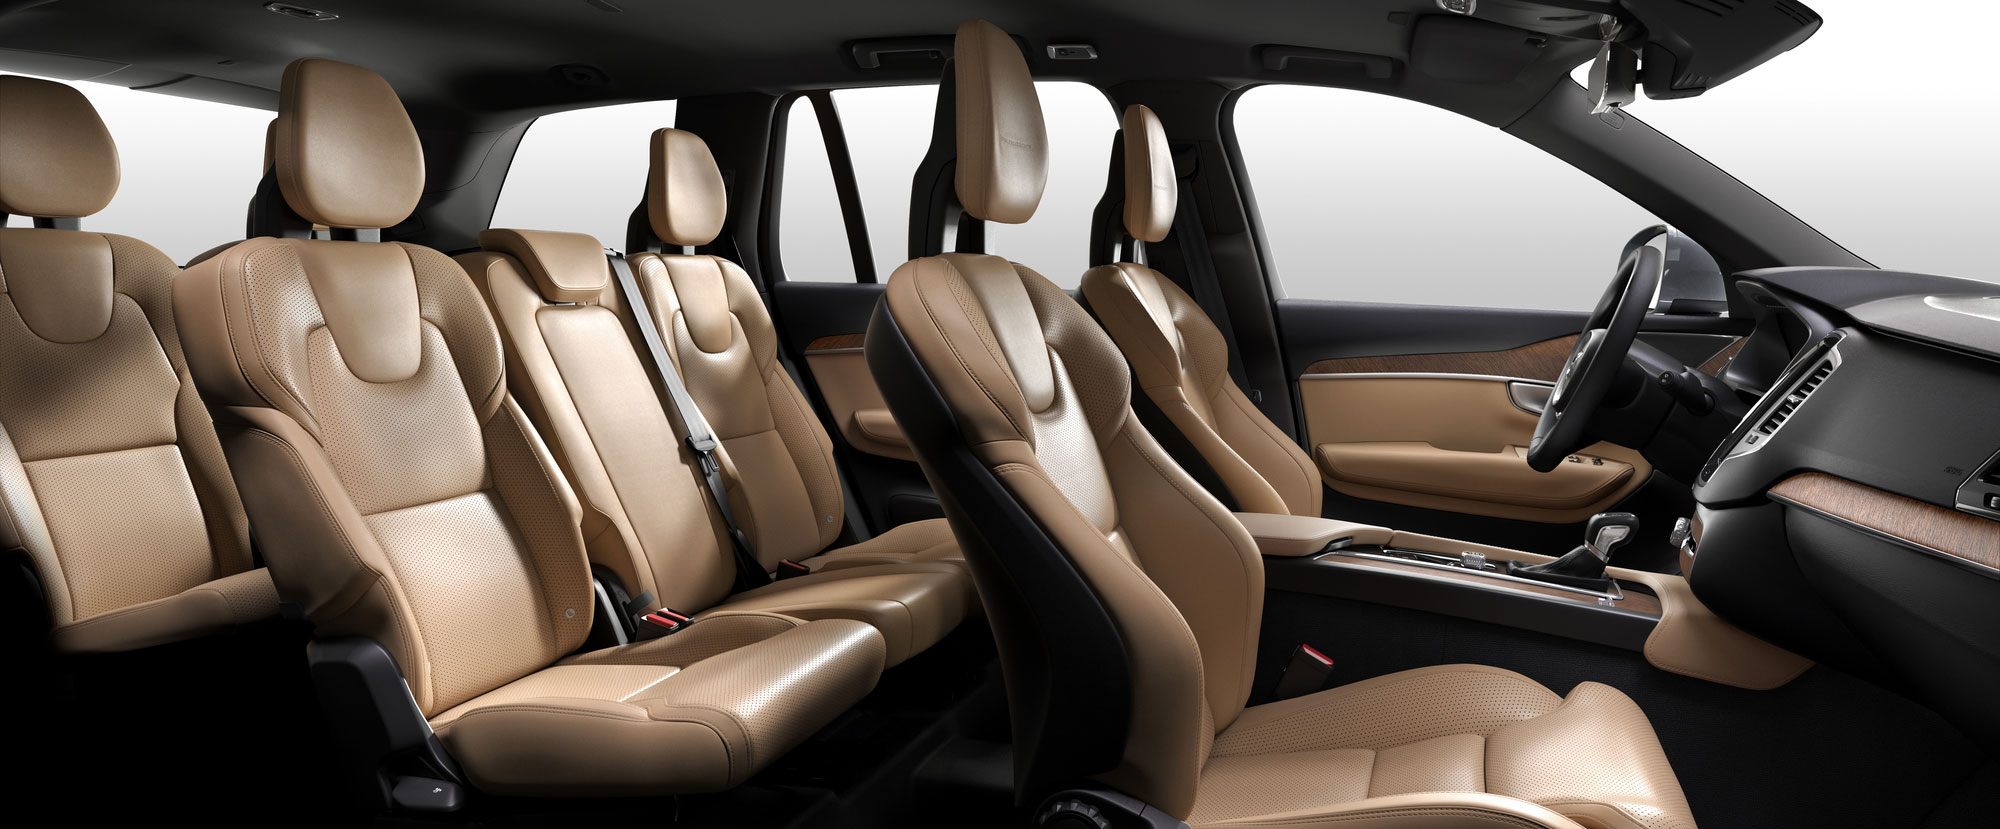 New Volvo Xc90 >> Volvo XC90 - Your Large Luxury Family SUV - Capitol Motors